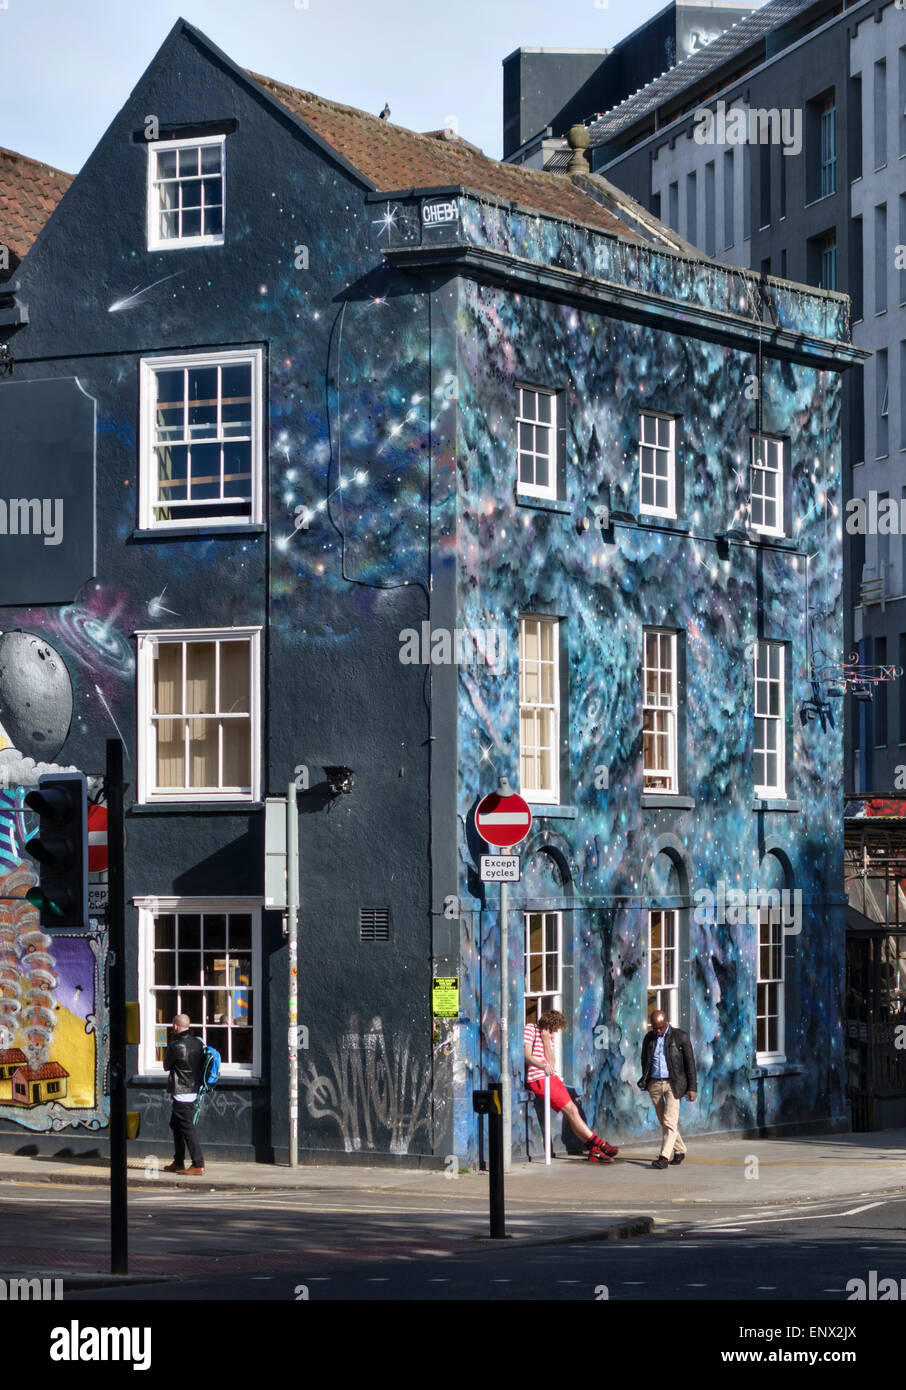 Full Moon, Stokes Croft, Bristol, UK. A backpacker's hostel painted by street artist Cheba - Stock Image